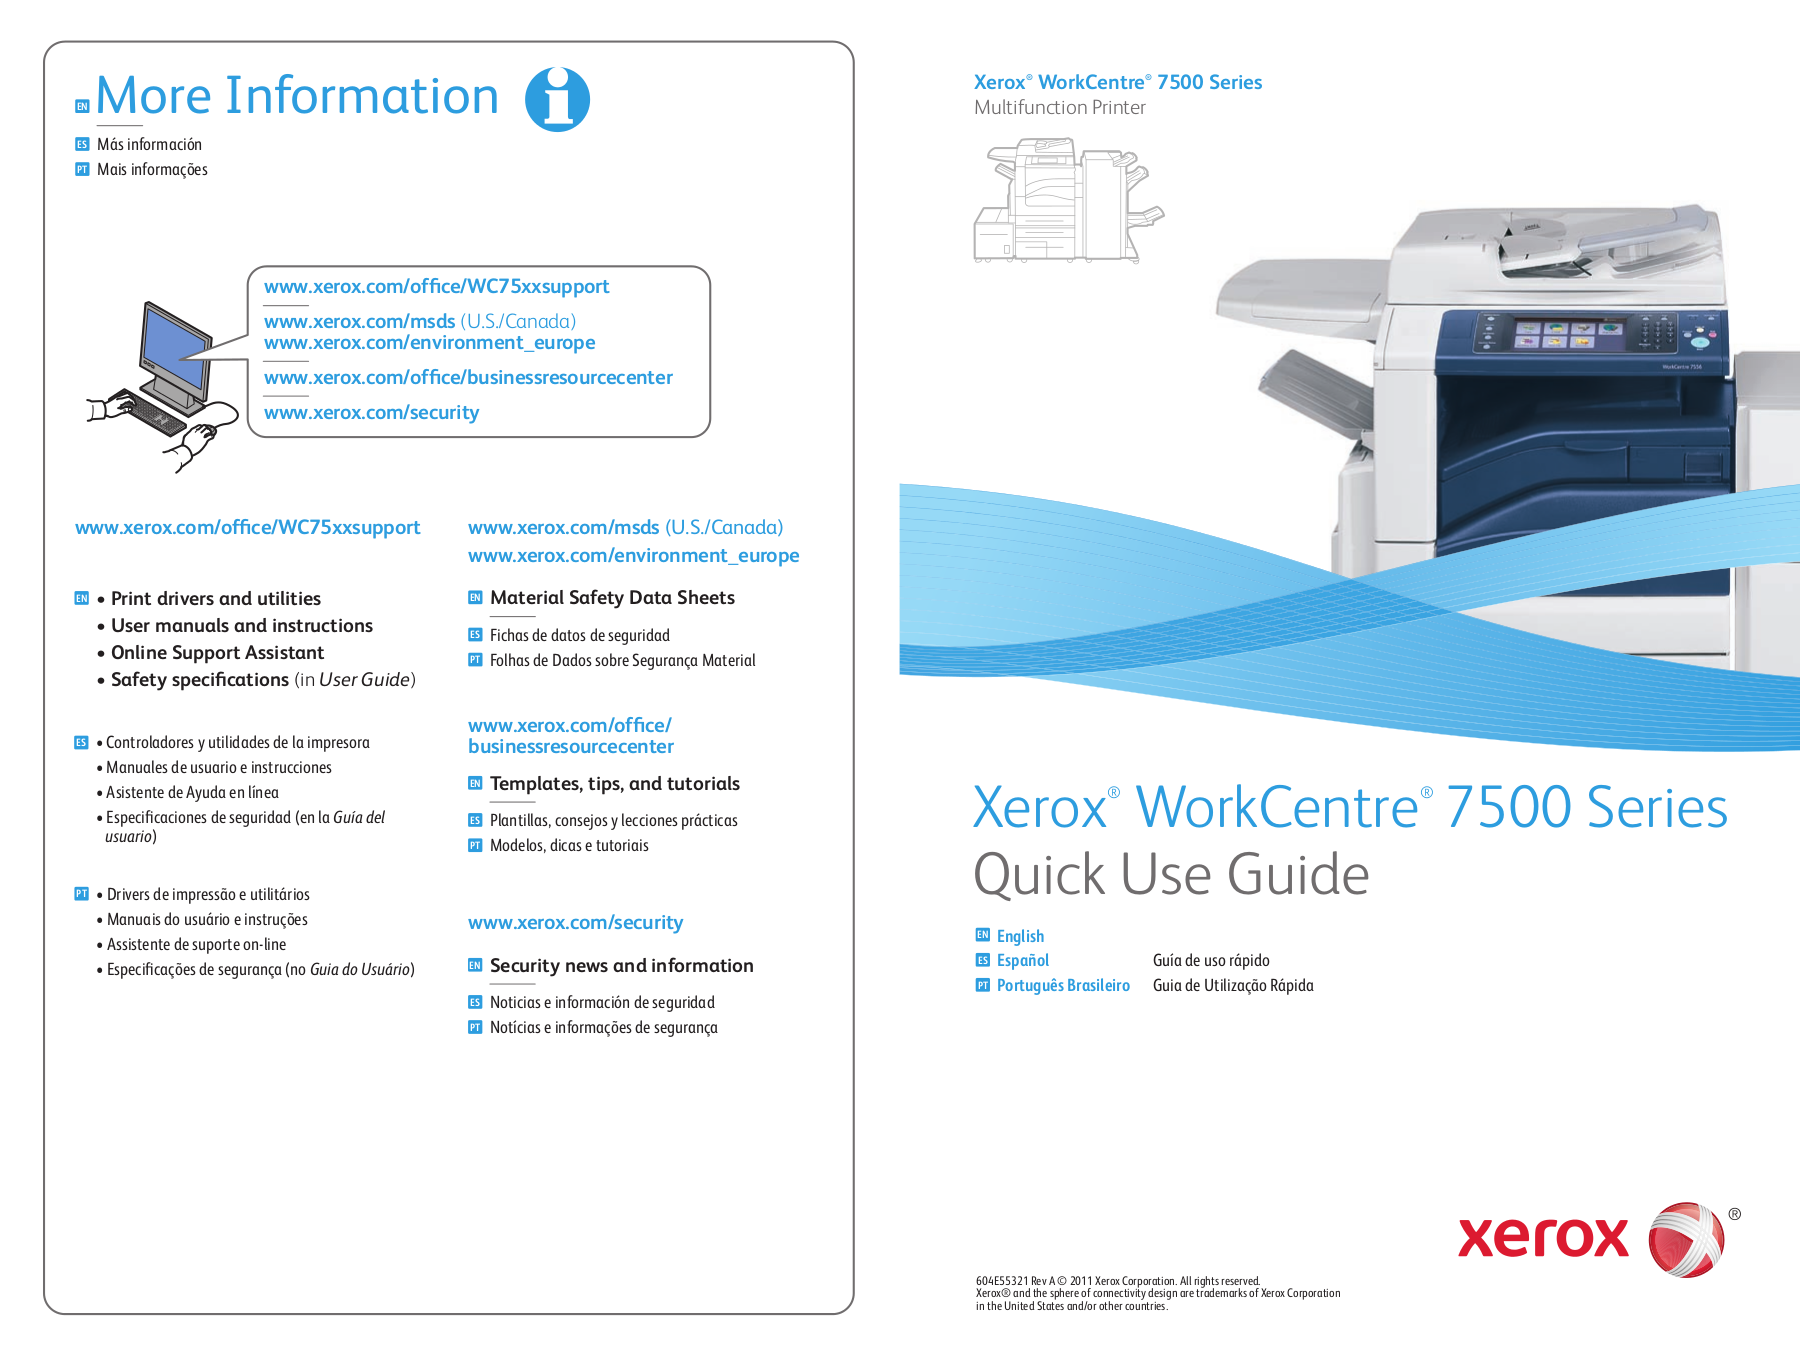 Pdf for xerox multifunction printer workcentre m128 manual